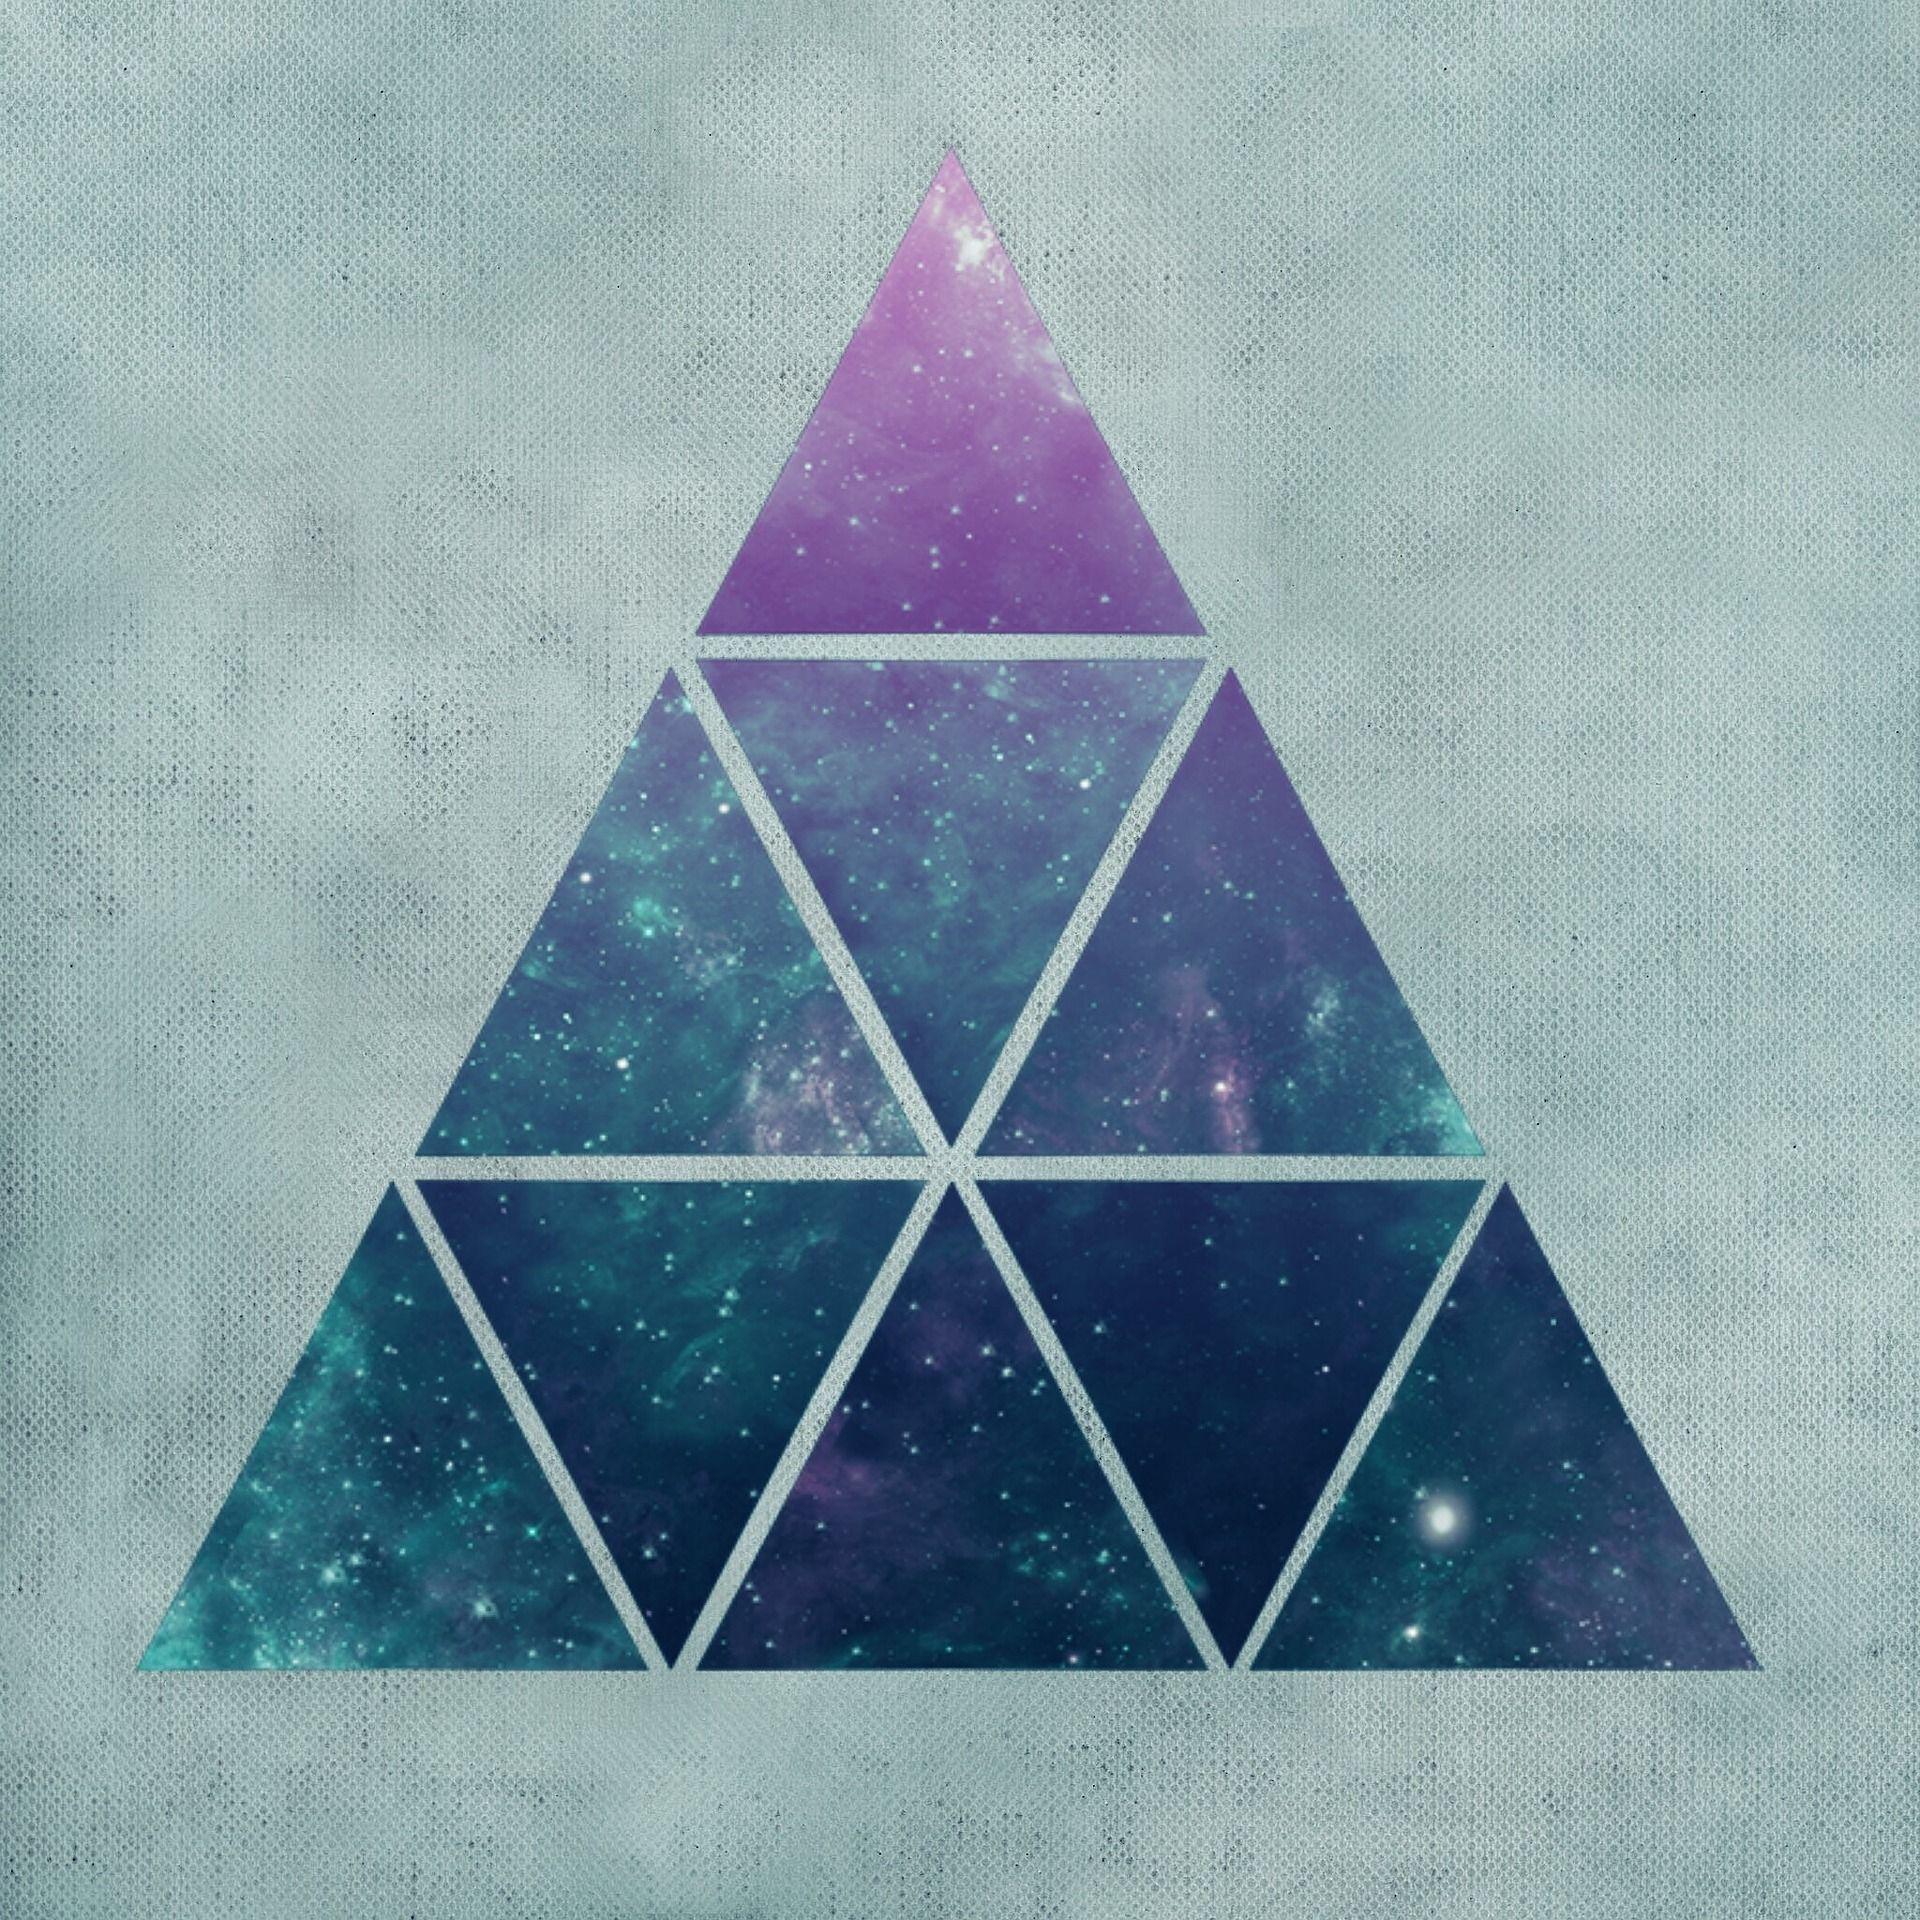 قانون محيط المثلث Triangle Tattoo Abstract Artwork Background